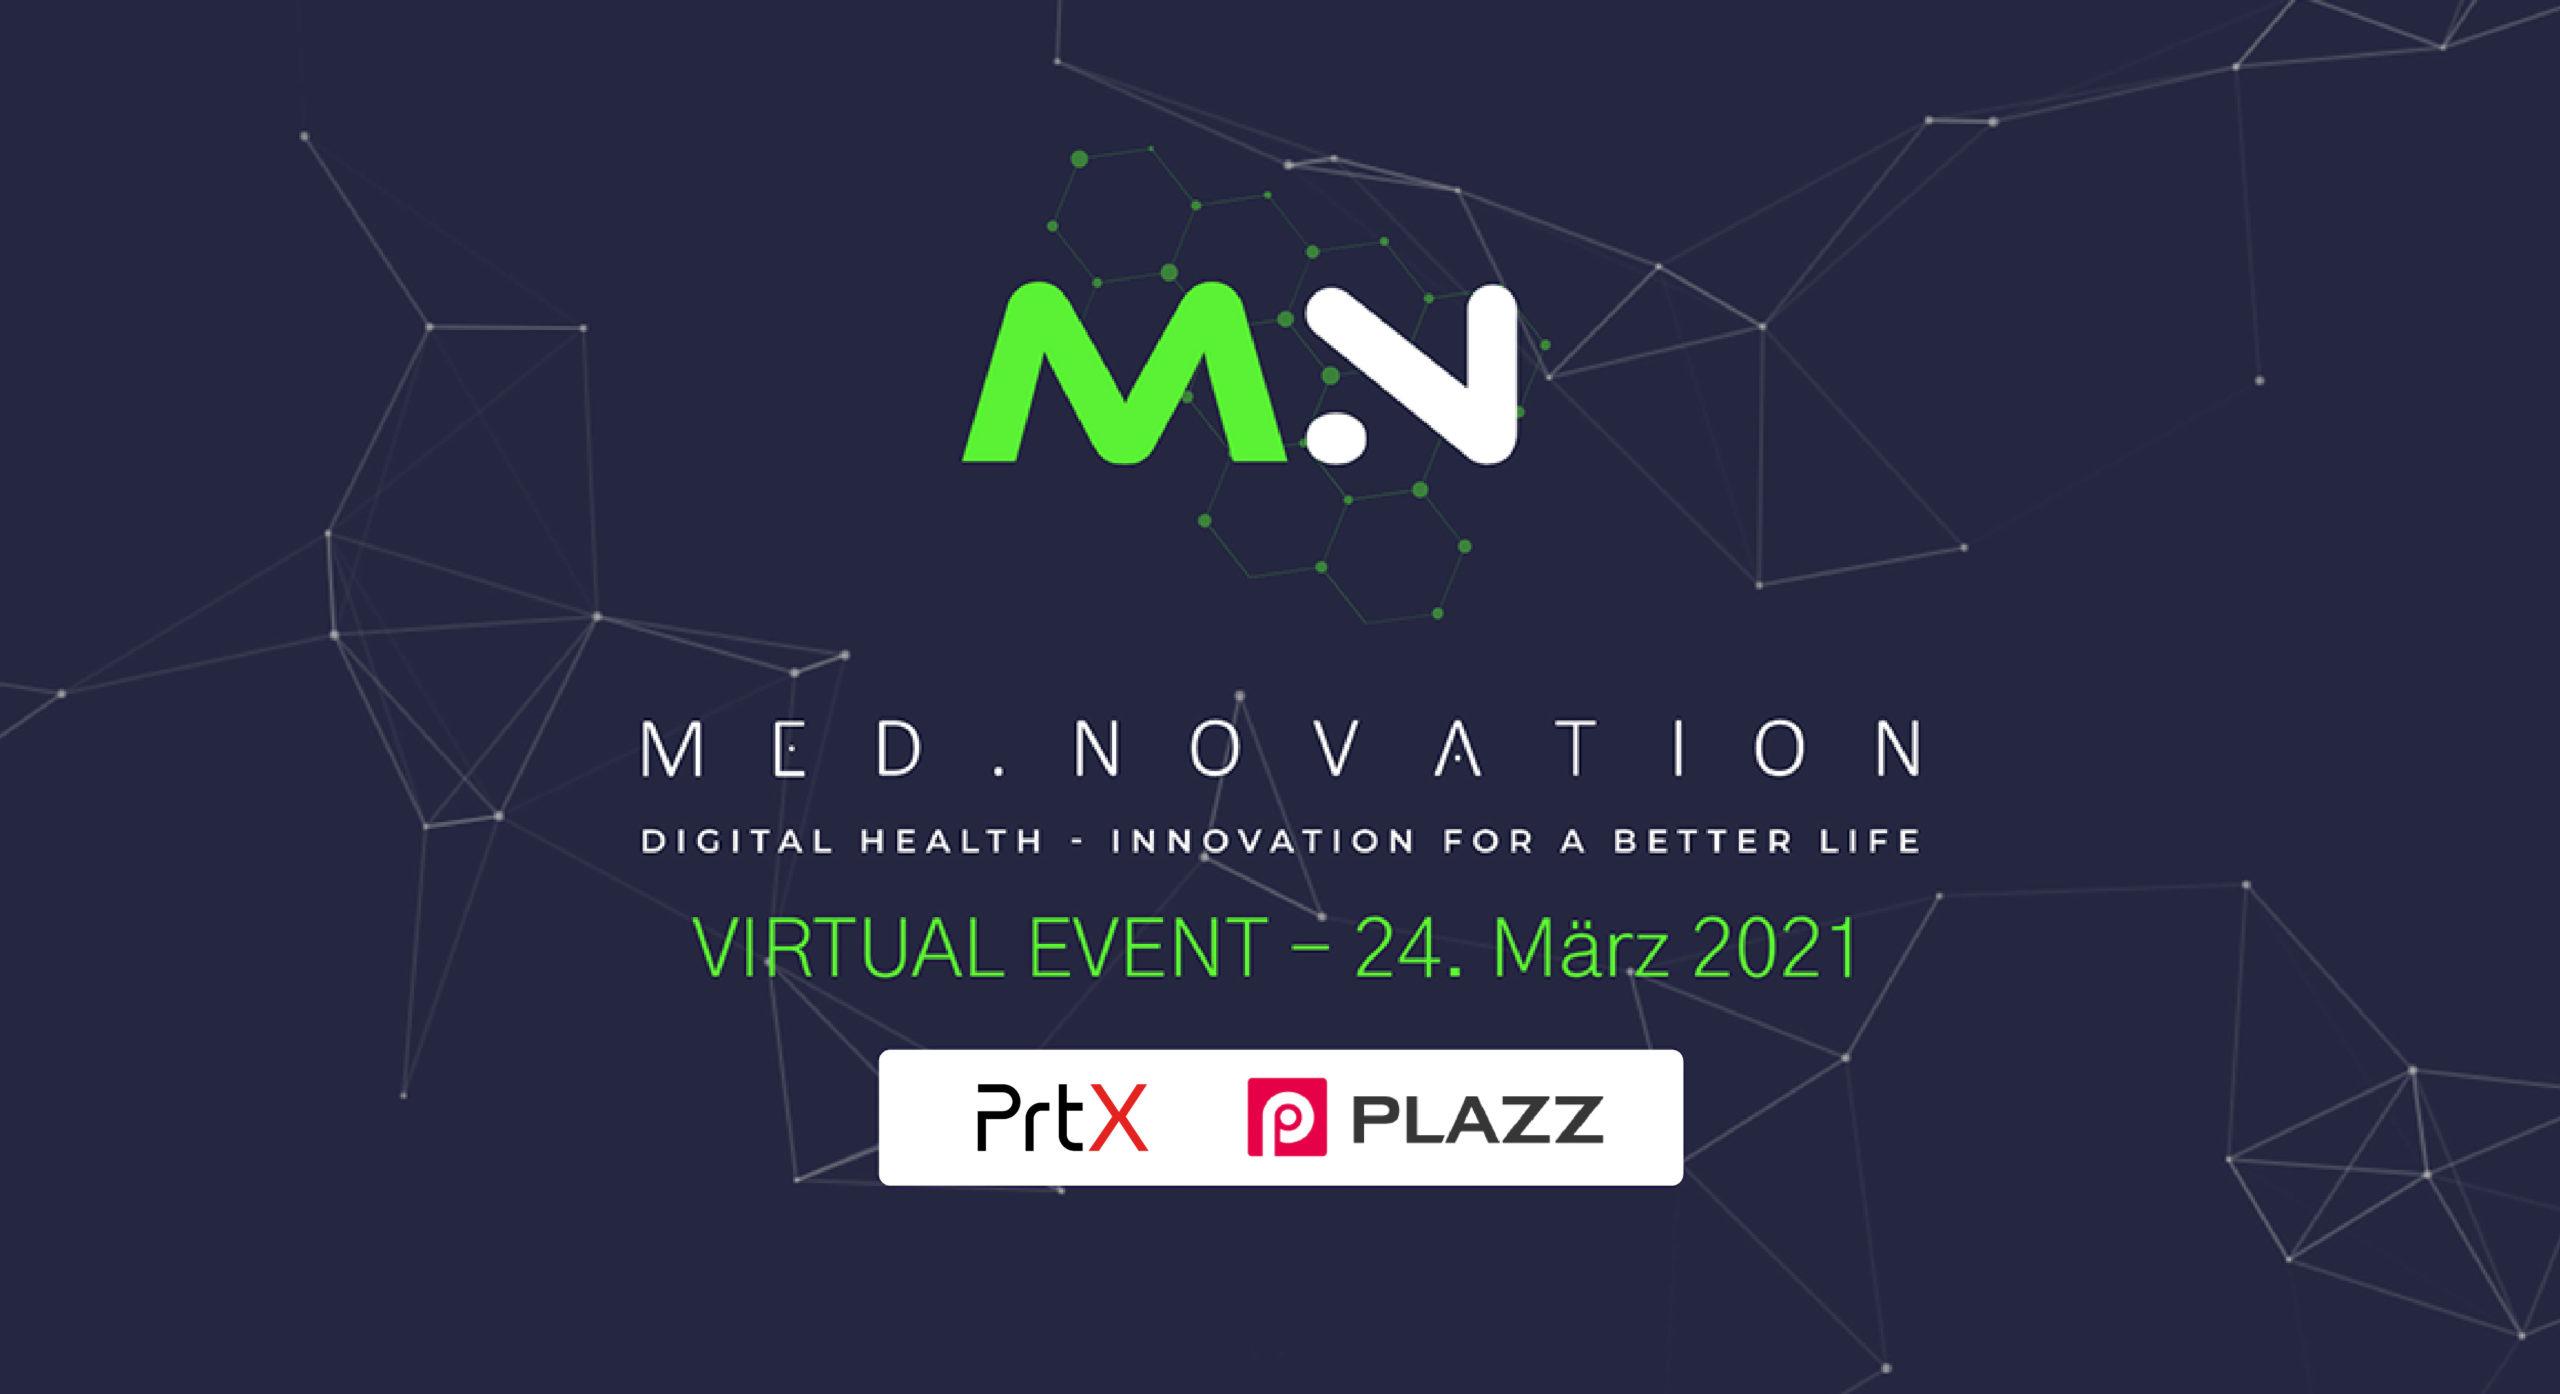 plazz AG als technischer Partner der MED.NOVATION